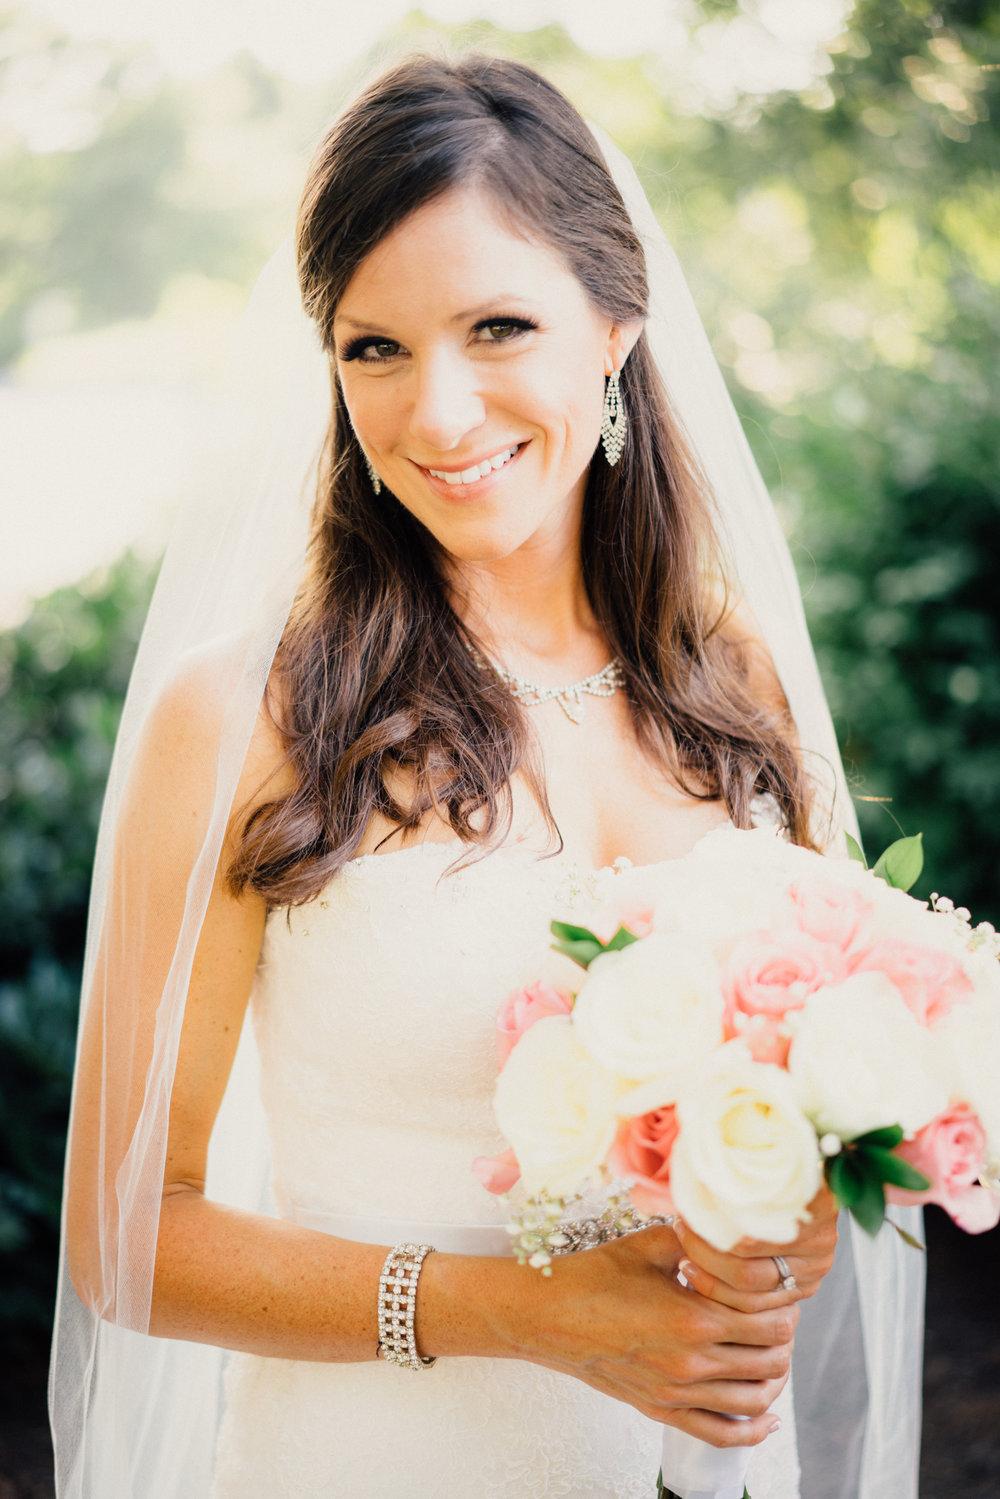 Mike_Steinmetz_Virginia_Wedding_Photographer_Favorites-34.jpg